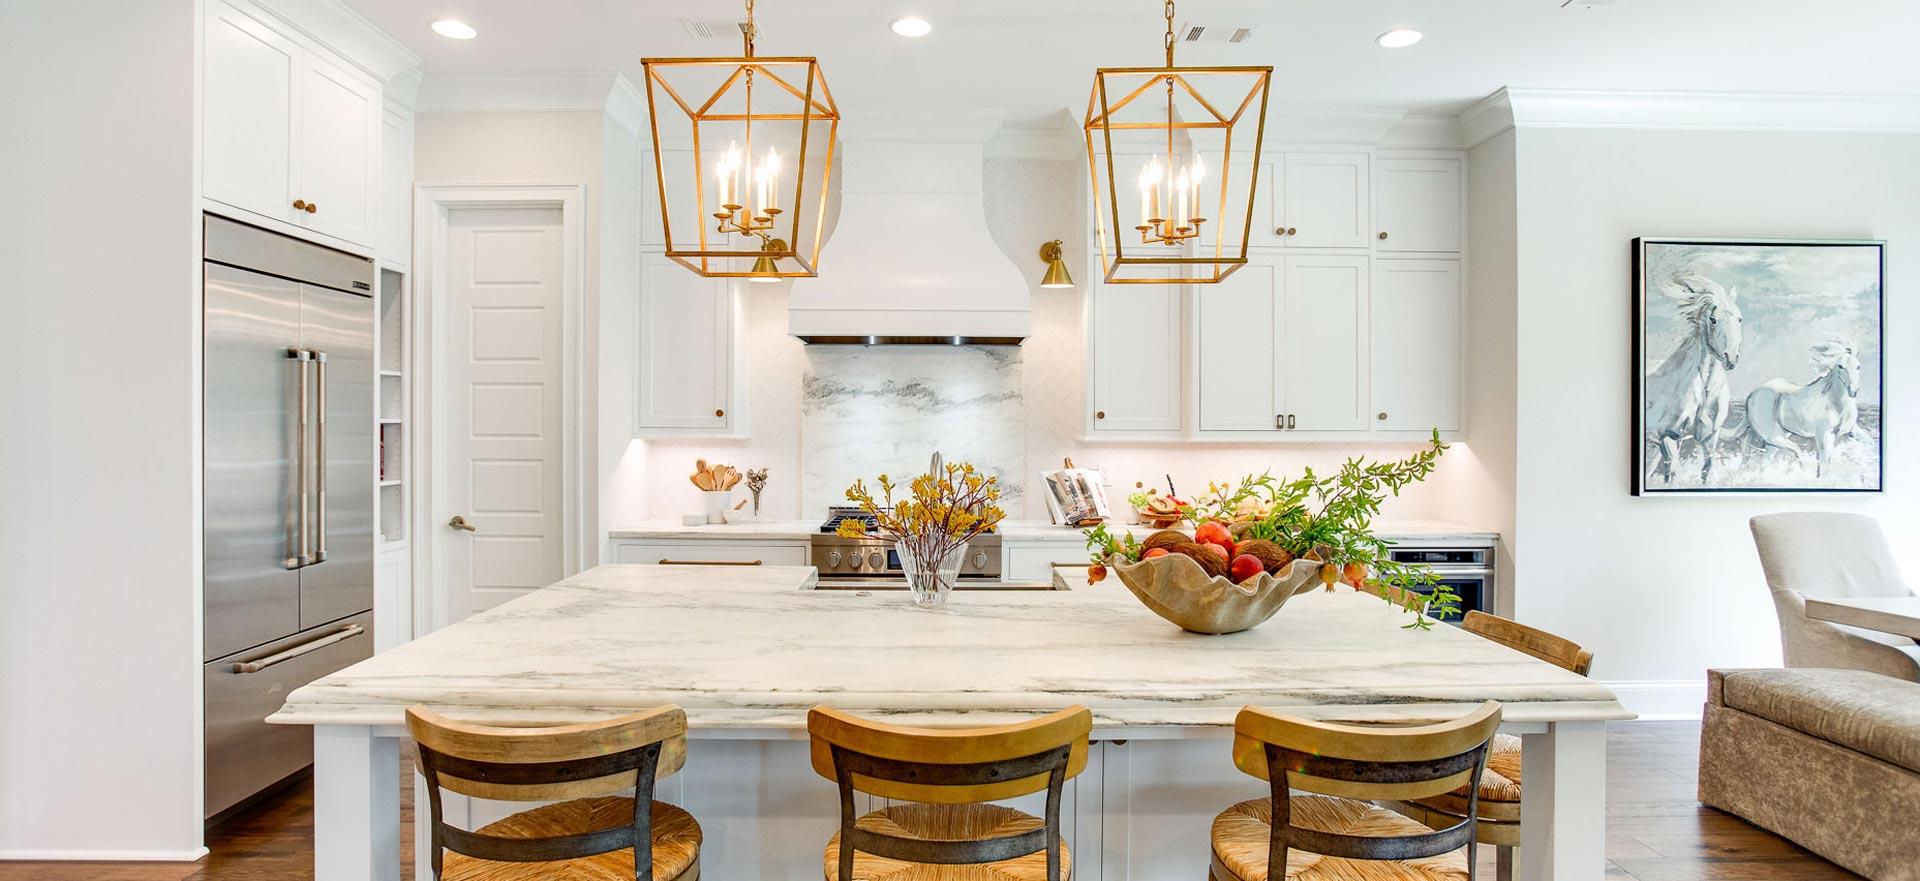 New Home Custom Kitchen Design Tuscaloosa, Alabama.